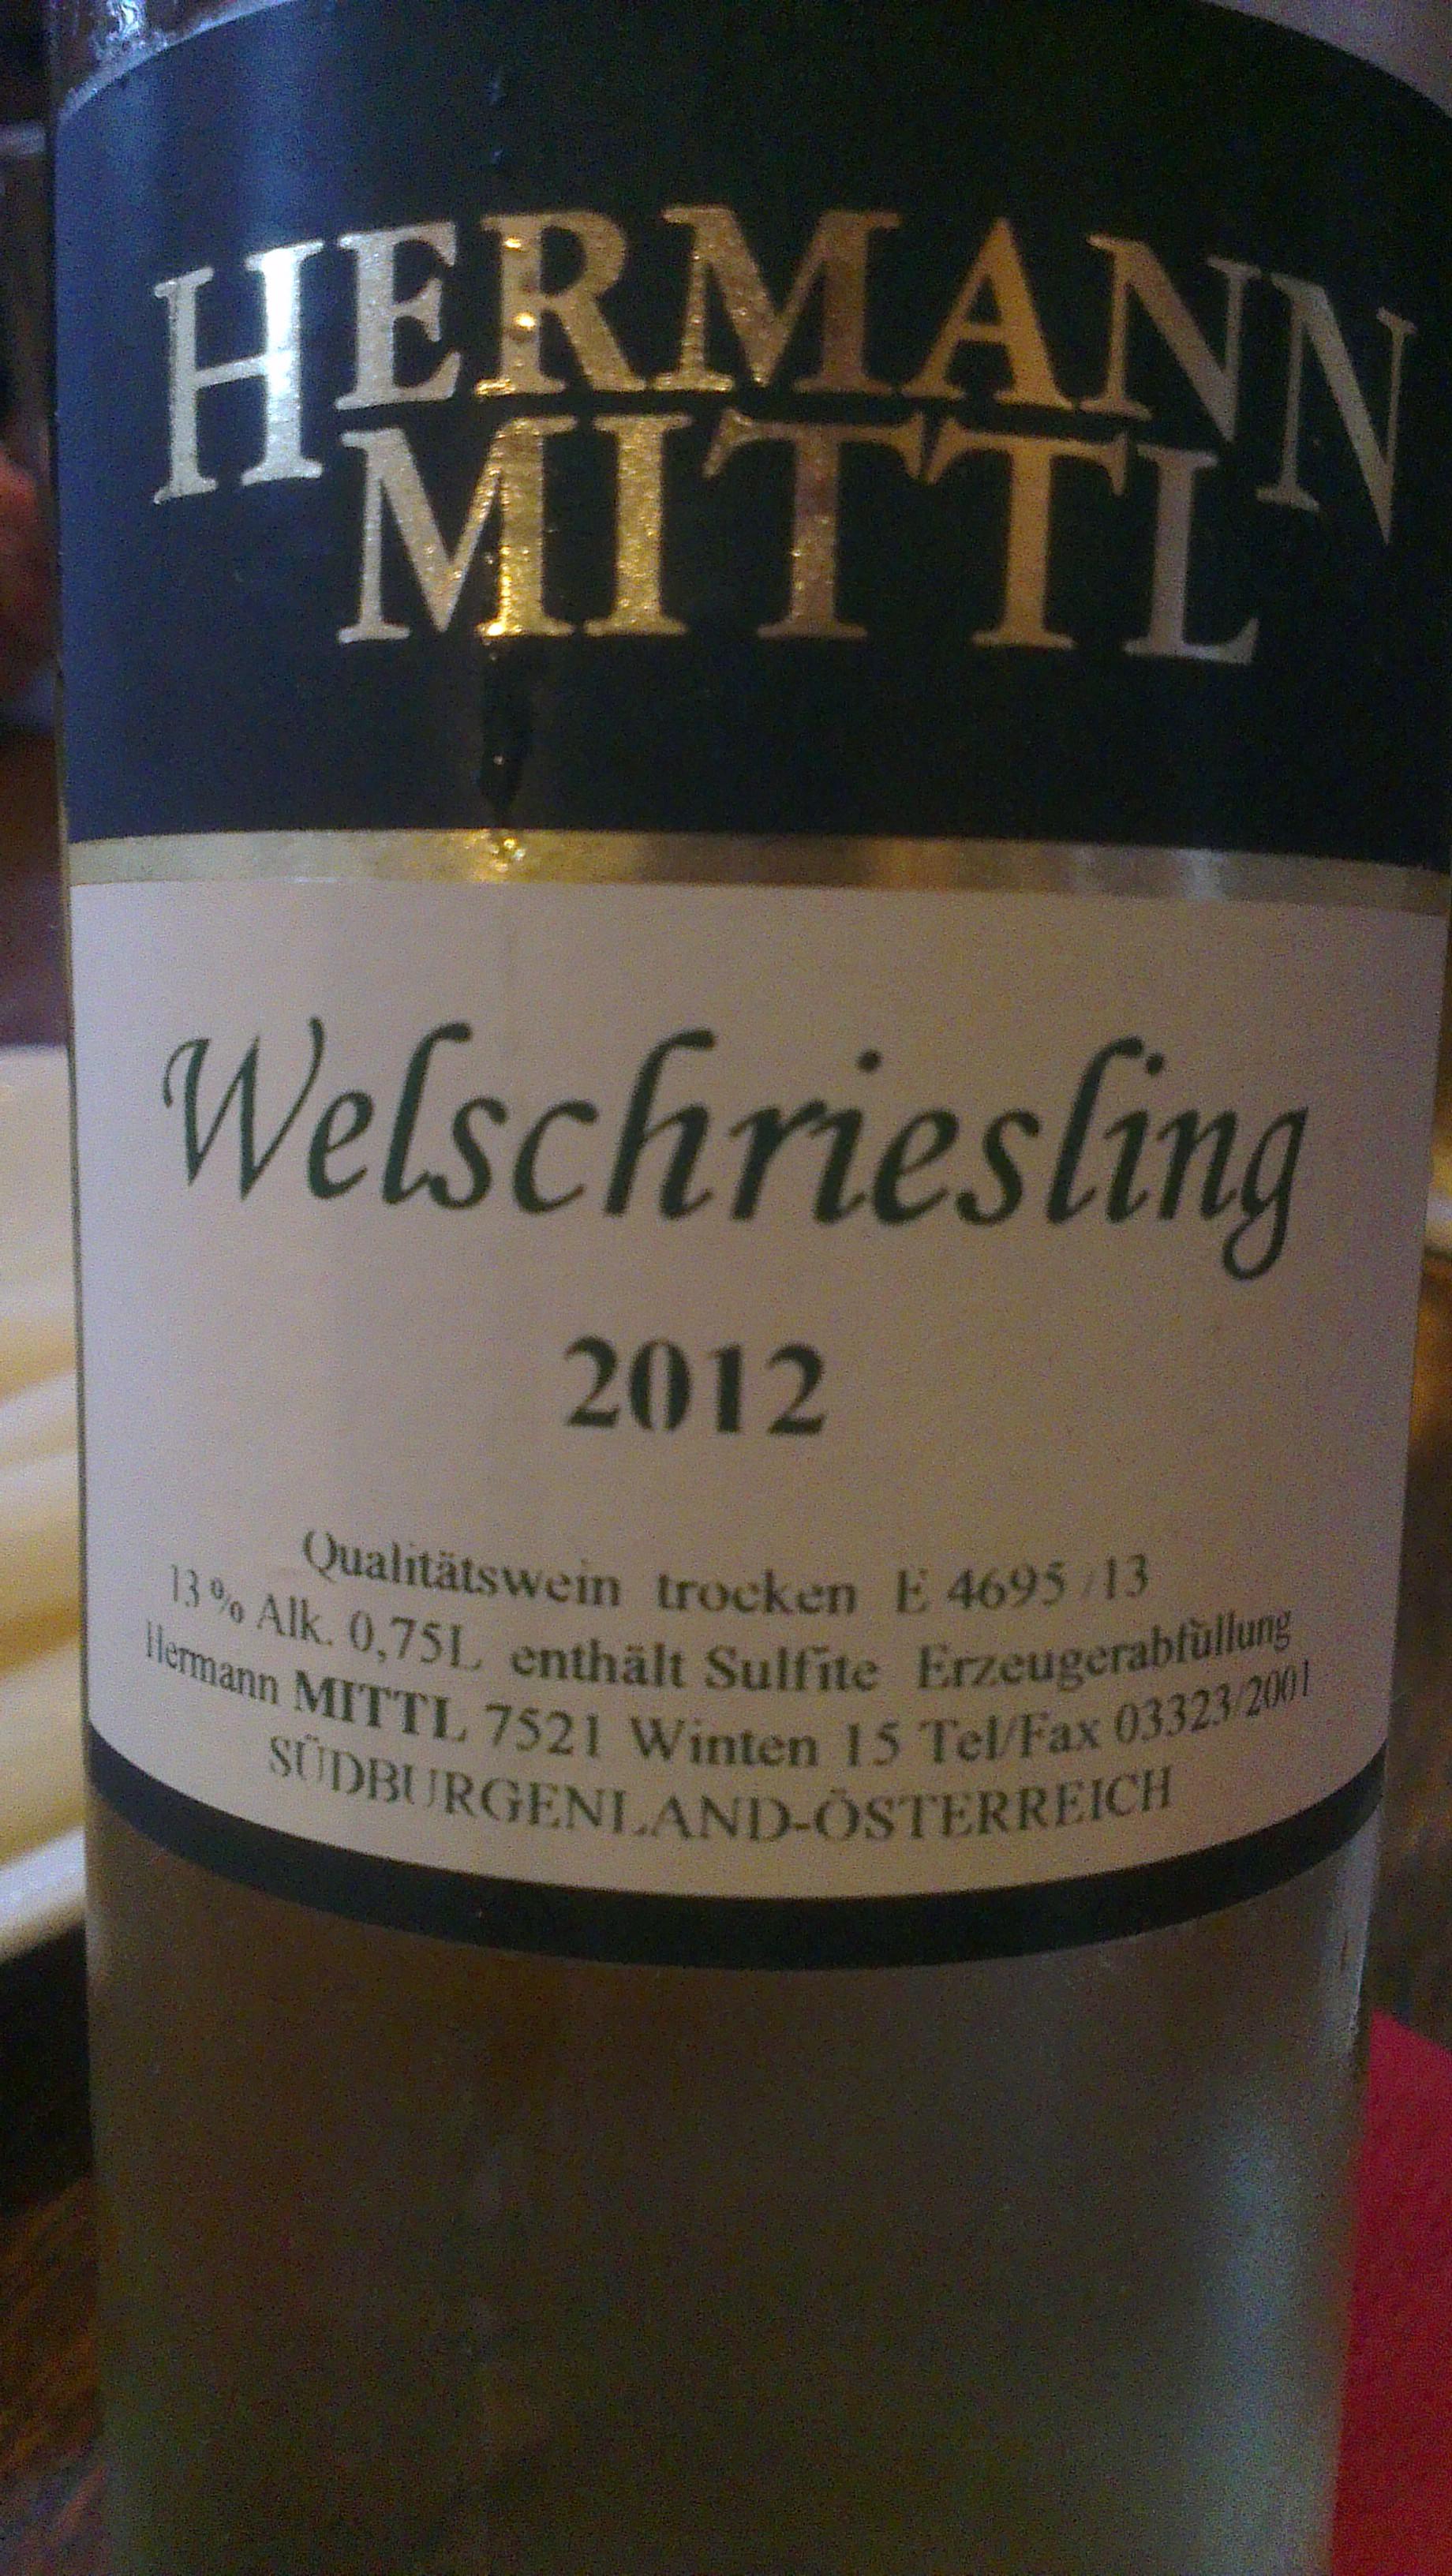 Hermann Mittl Welchriesling 2012, nuestro primer vino austriaco